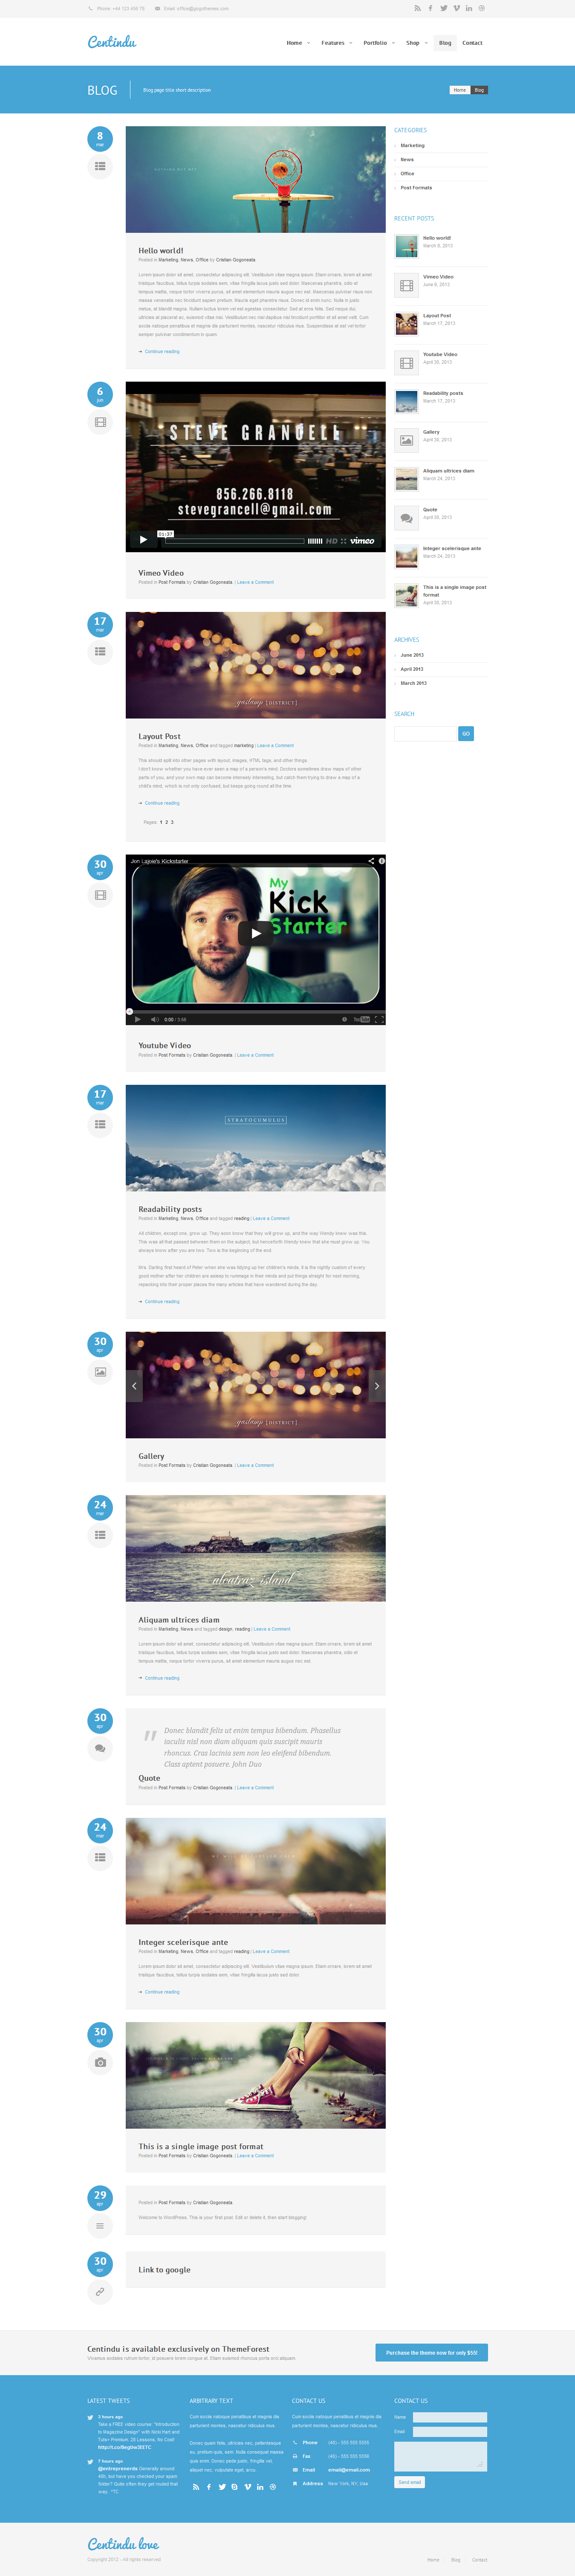 Gmail theme gallery - Centindu Portfolio Shop Wordpress Theme